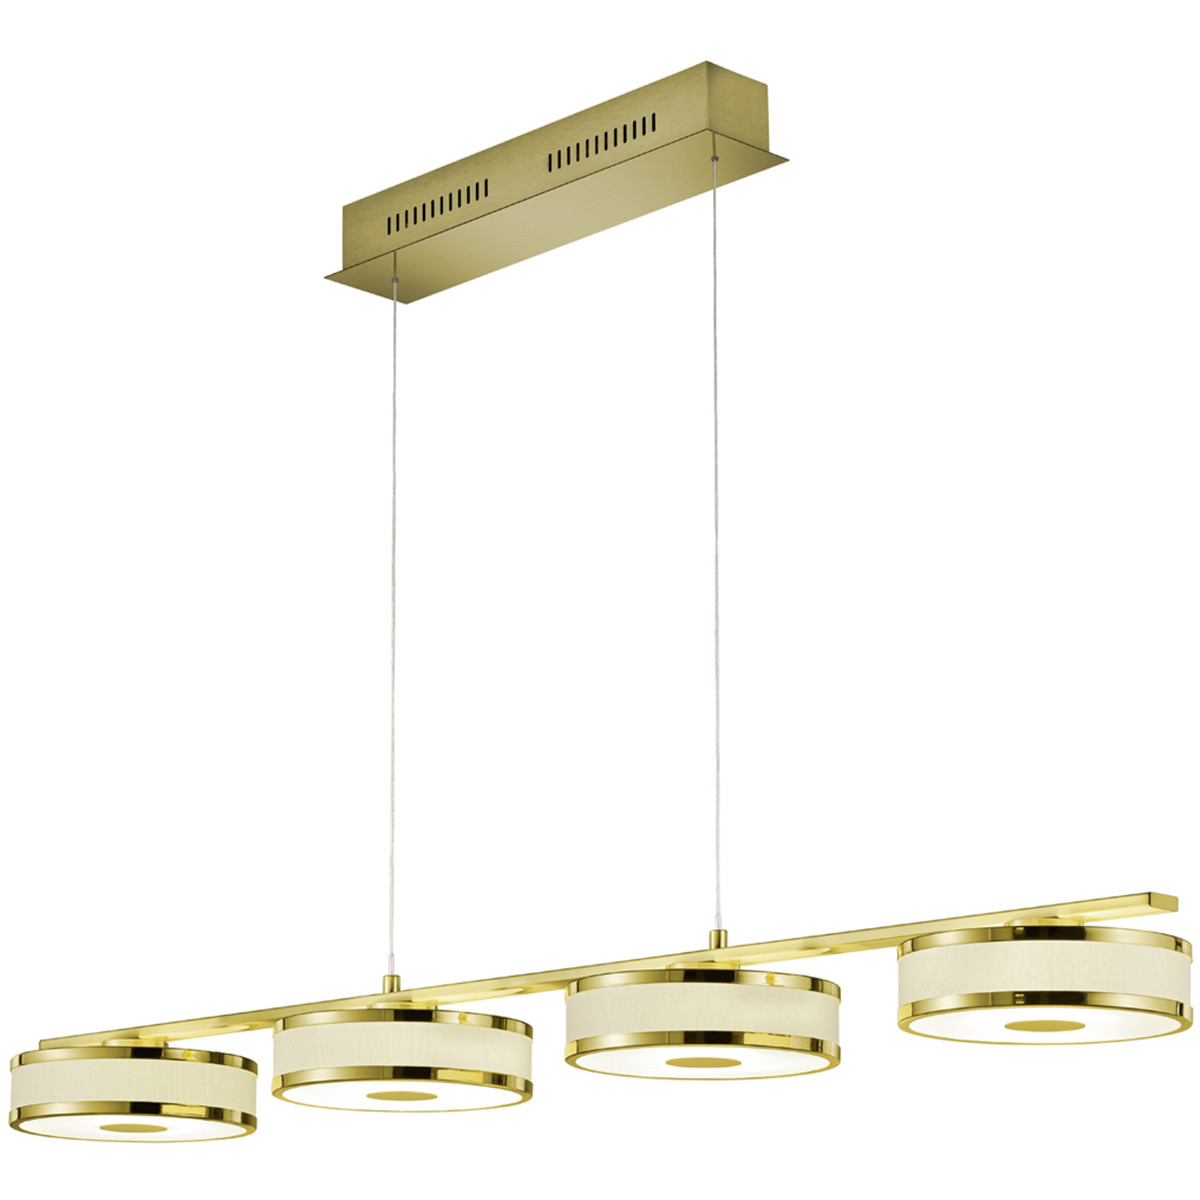 LED Hanglamp - Trion Agiany - 28W - Warm Wit 3000K - 4-lichts - Dimbaar - Rechthoek - Mat Goud - Alu